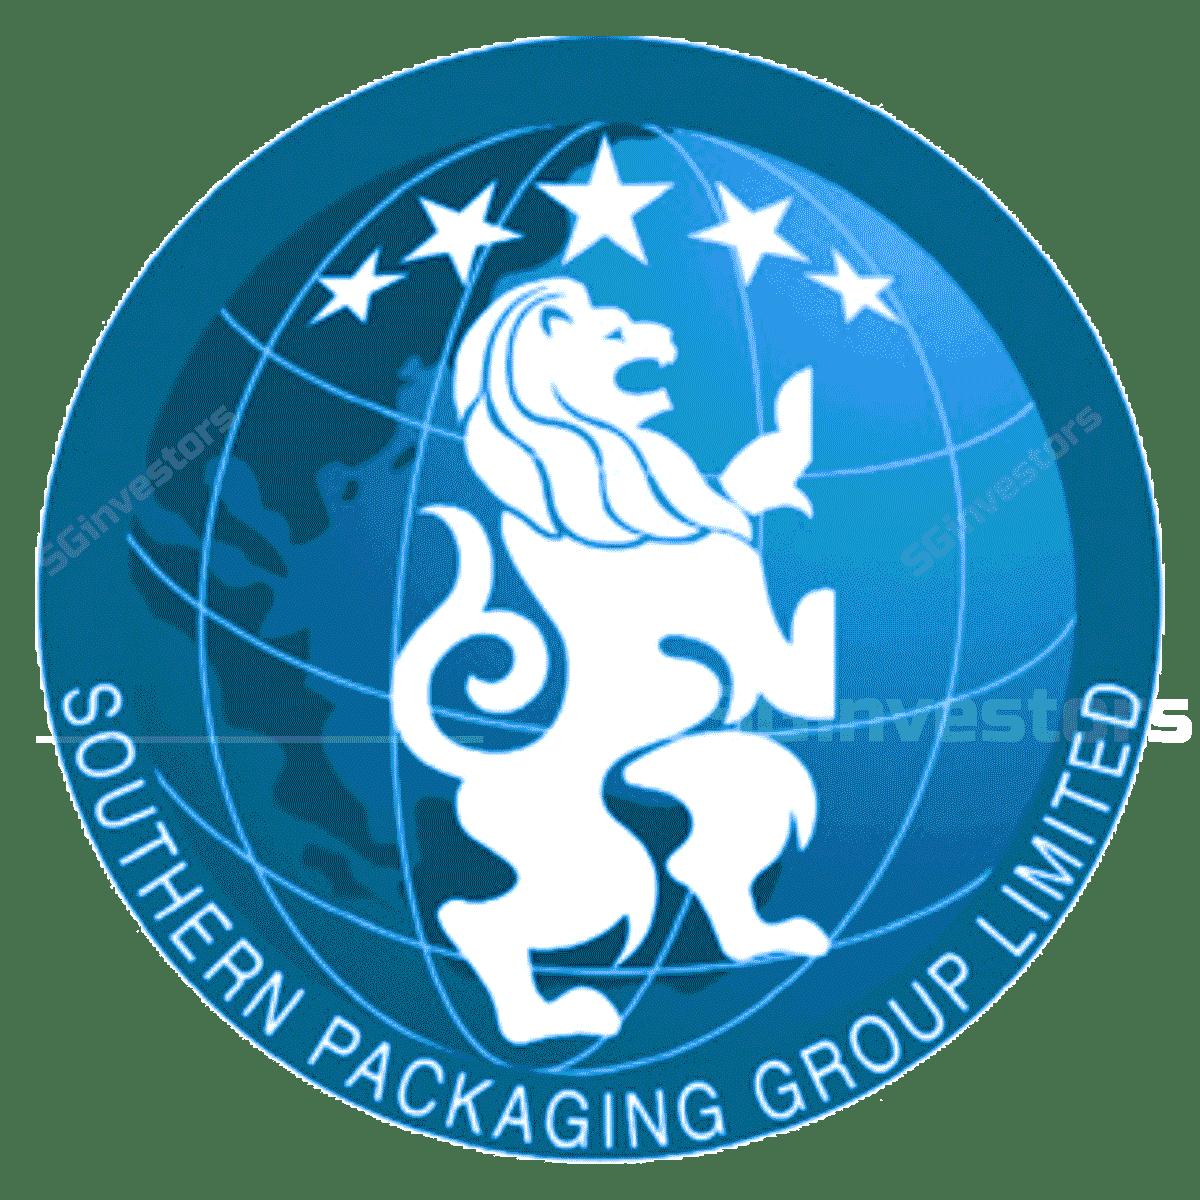 SOUTHERN PACKAGING GROUP LTD (SGX:BQP) @ SGinvestors.io